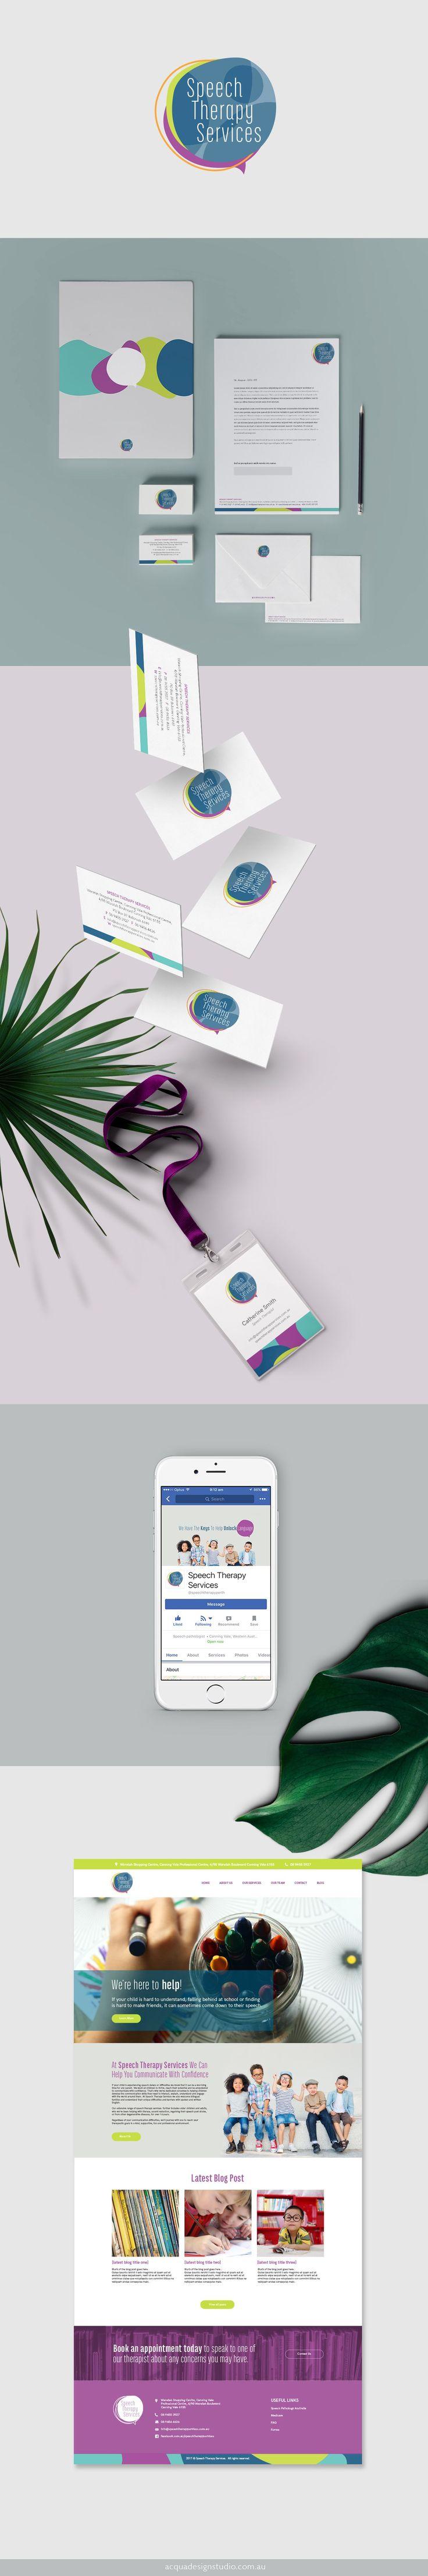 Speech Therapy Services Rebrand / Acqua Design Studio / acquadesignstudio.com.au